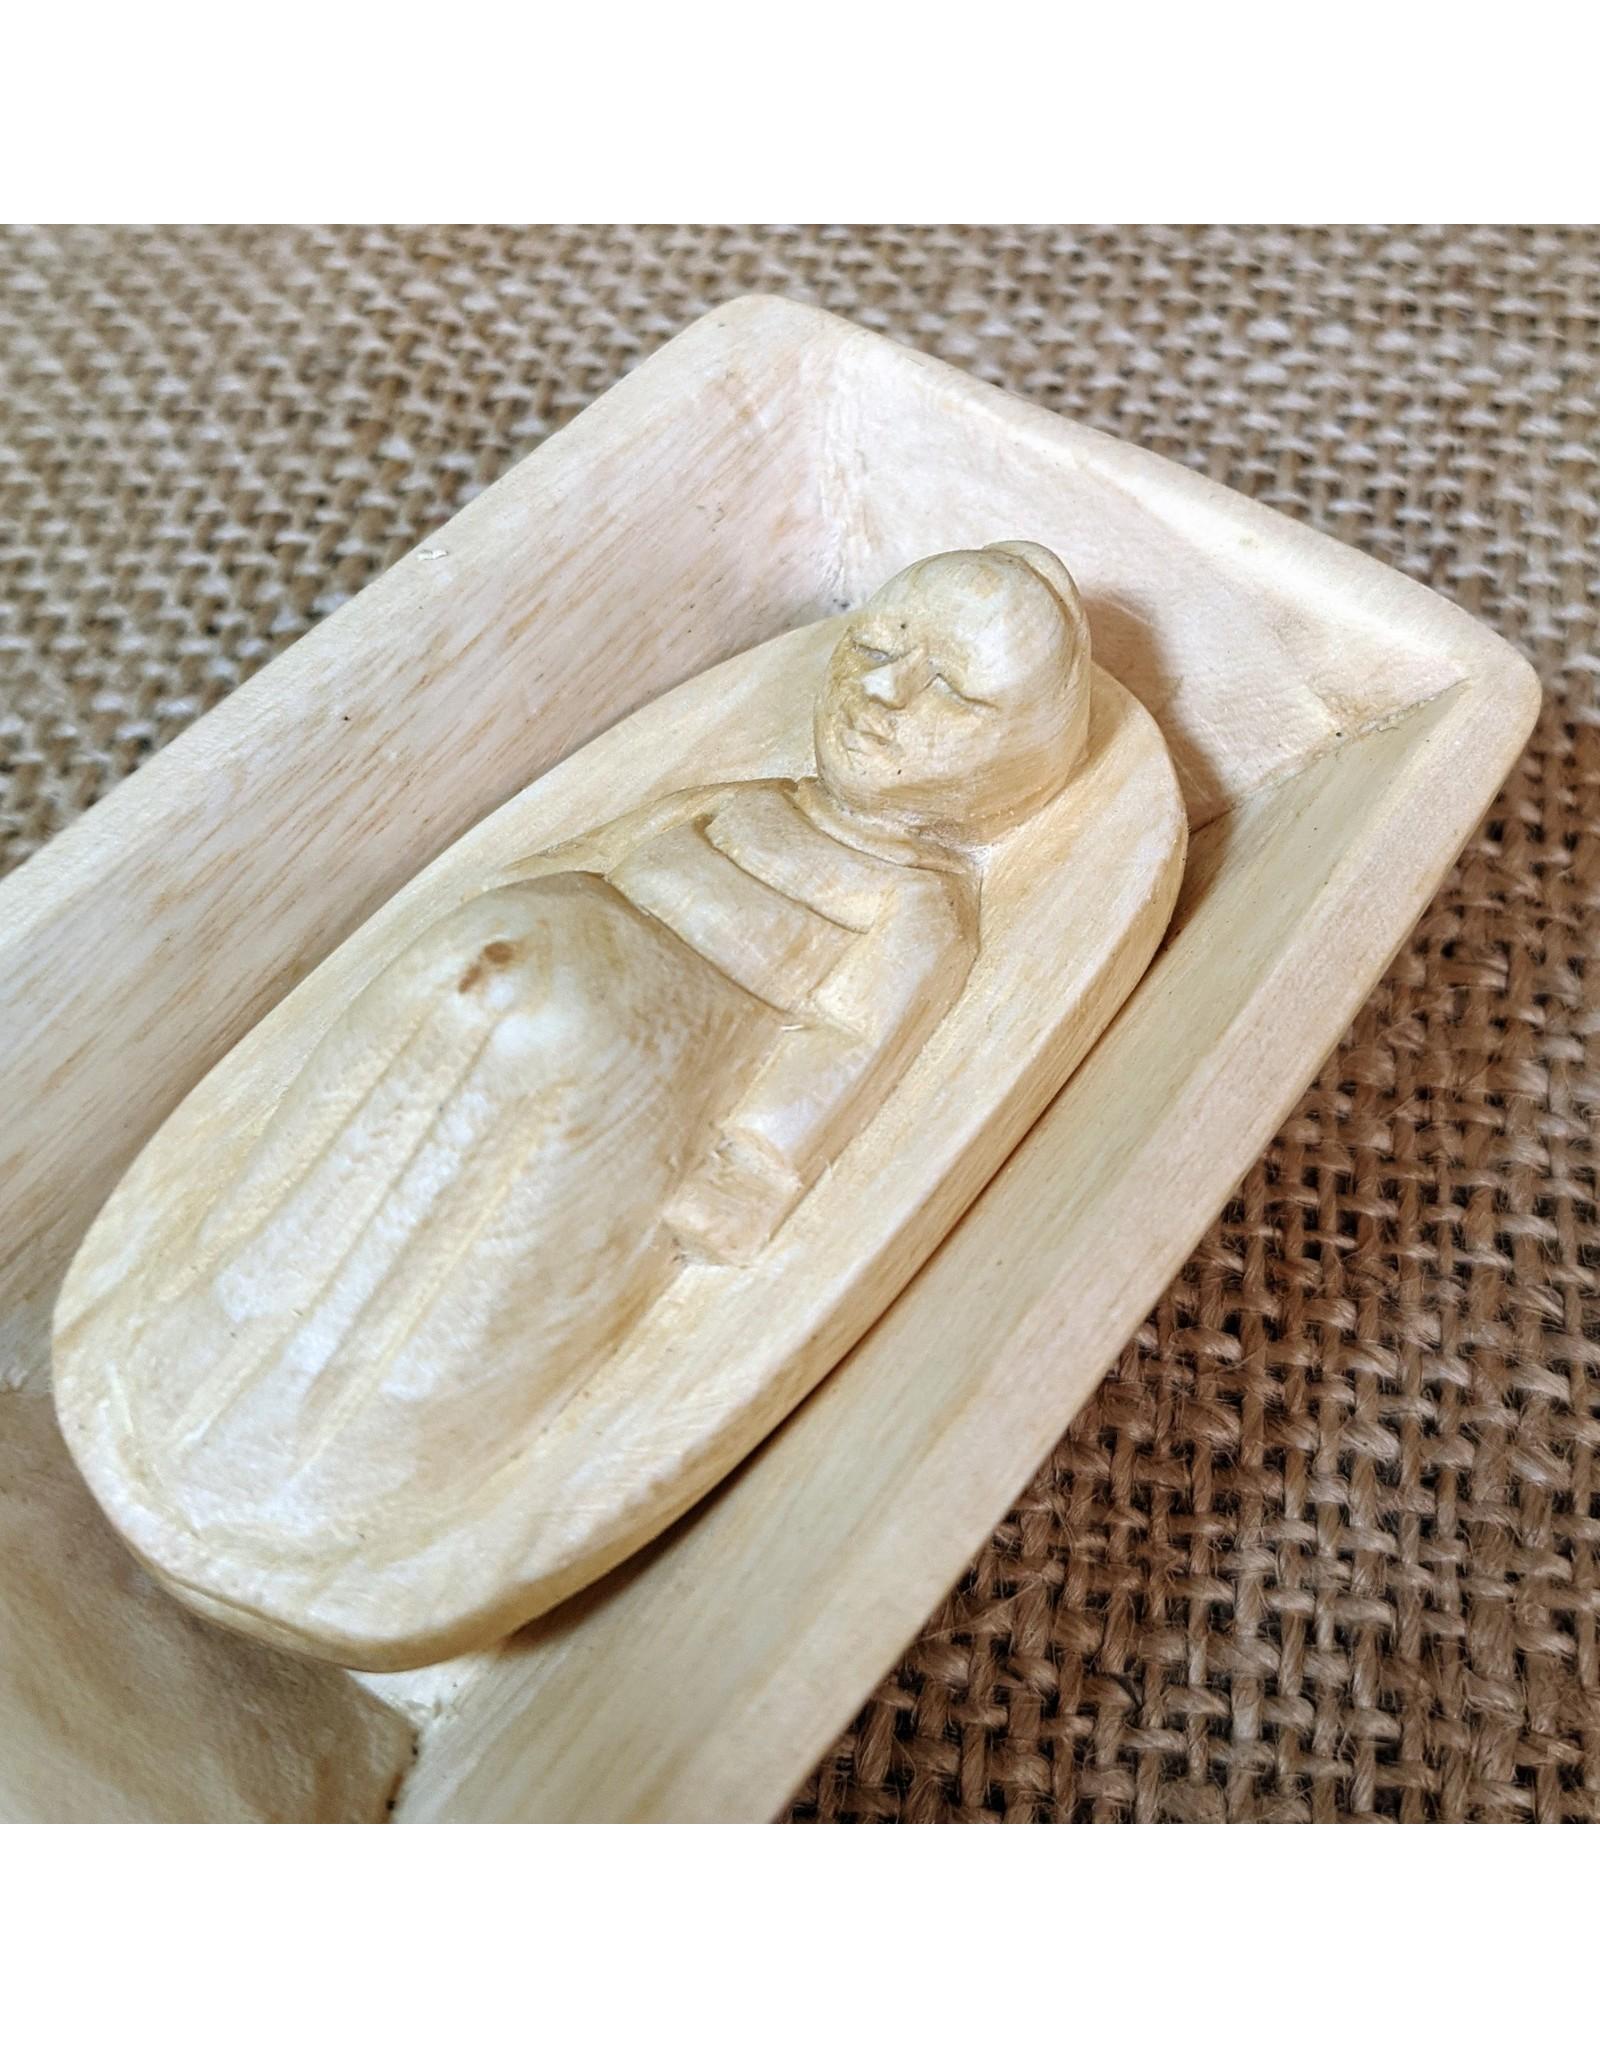 Soko Home Carved Nativity, Beeswax finish. Rwanda